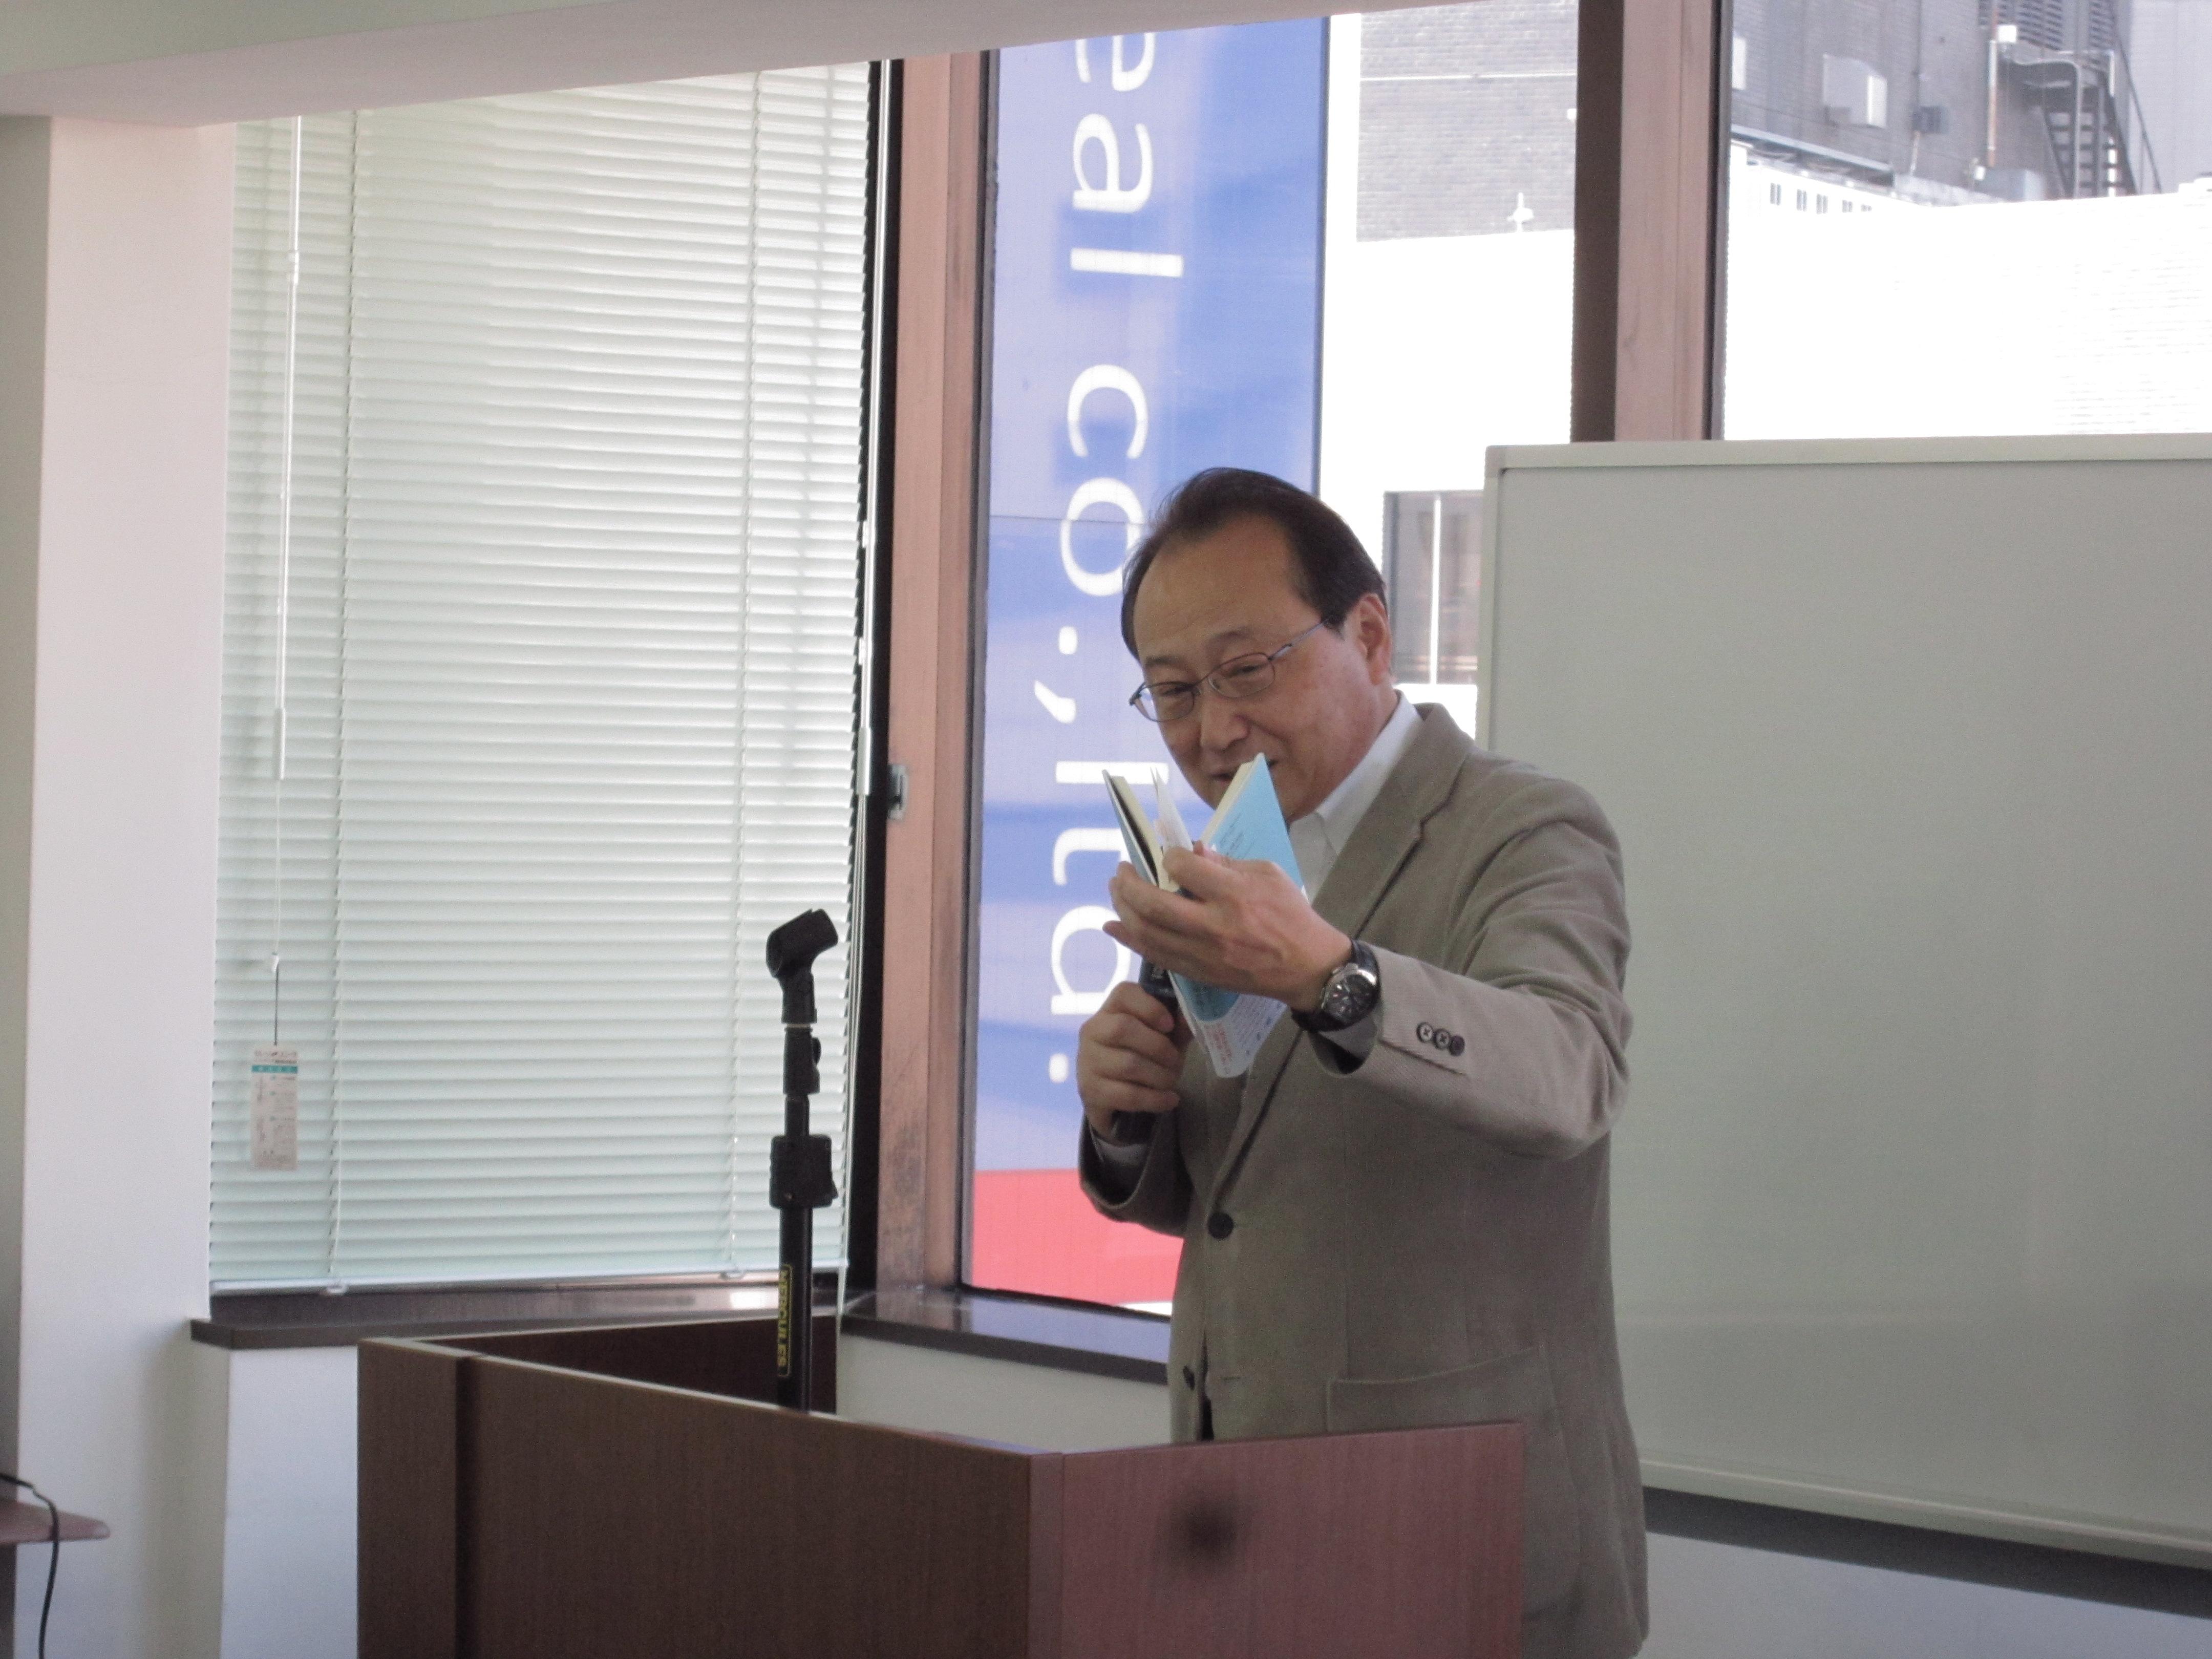 IMG 5587 - 4月1日東京思風塾の開催になります。